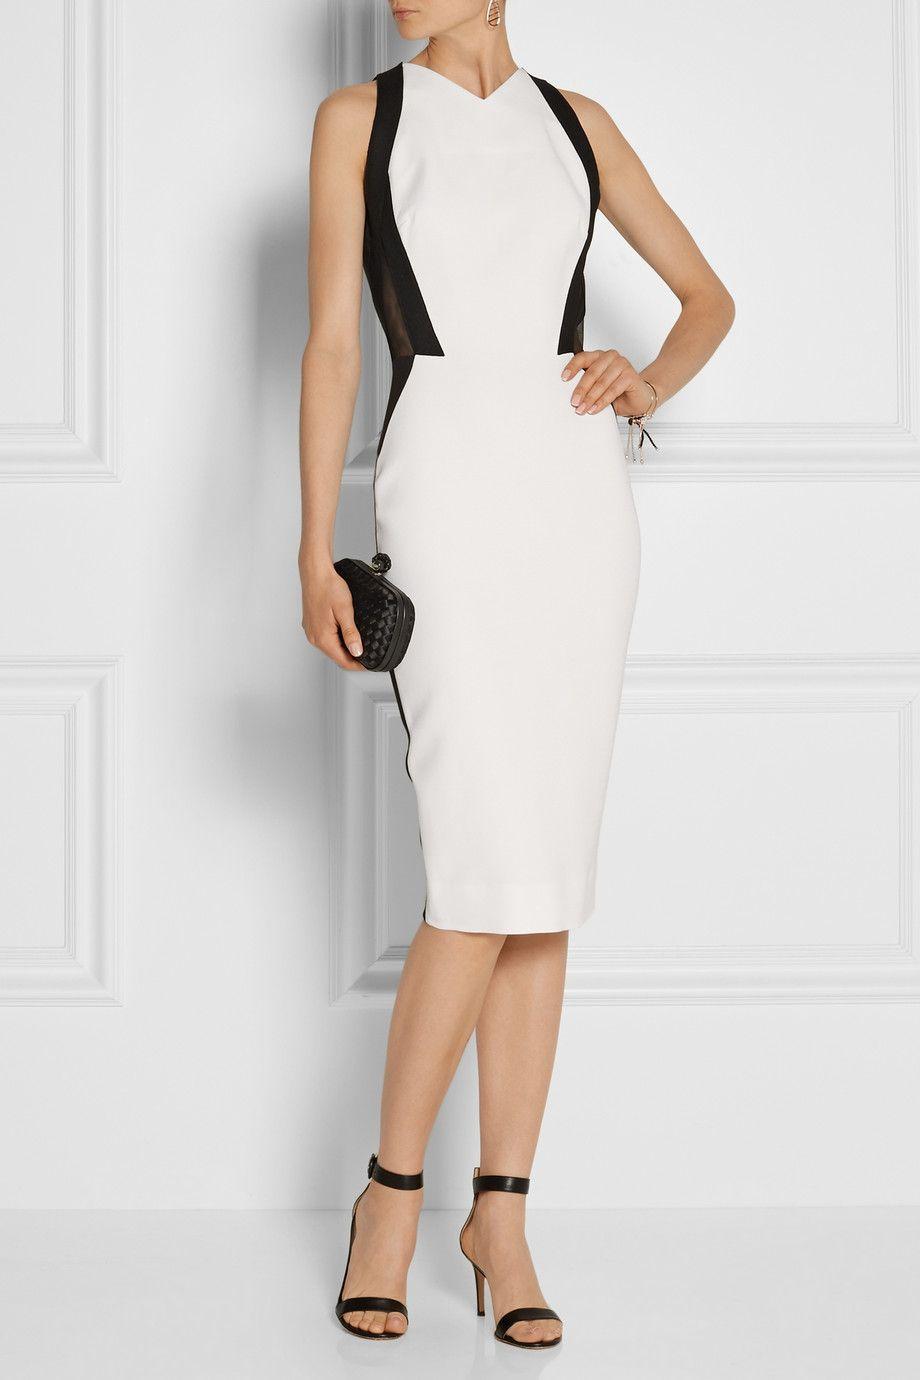 Victoria Beckham Two Tone Silk And Wool Blend Cady Dress Moda Moda Femenina Ropa [ 1380 x 920 Pixel ]